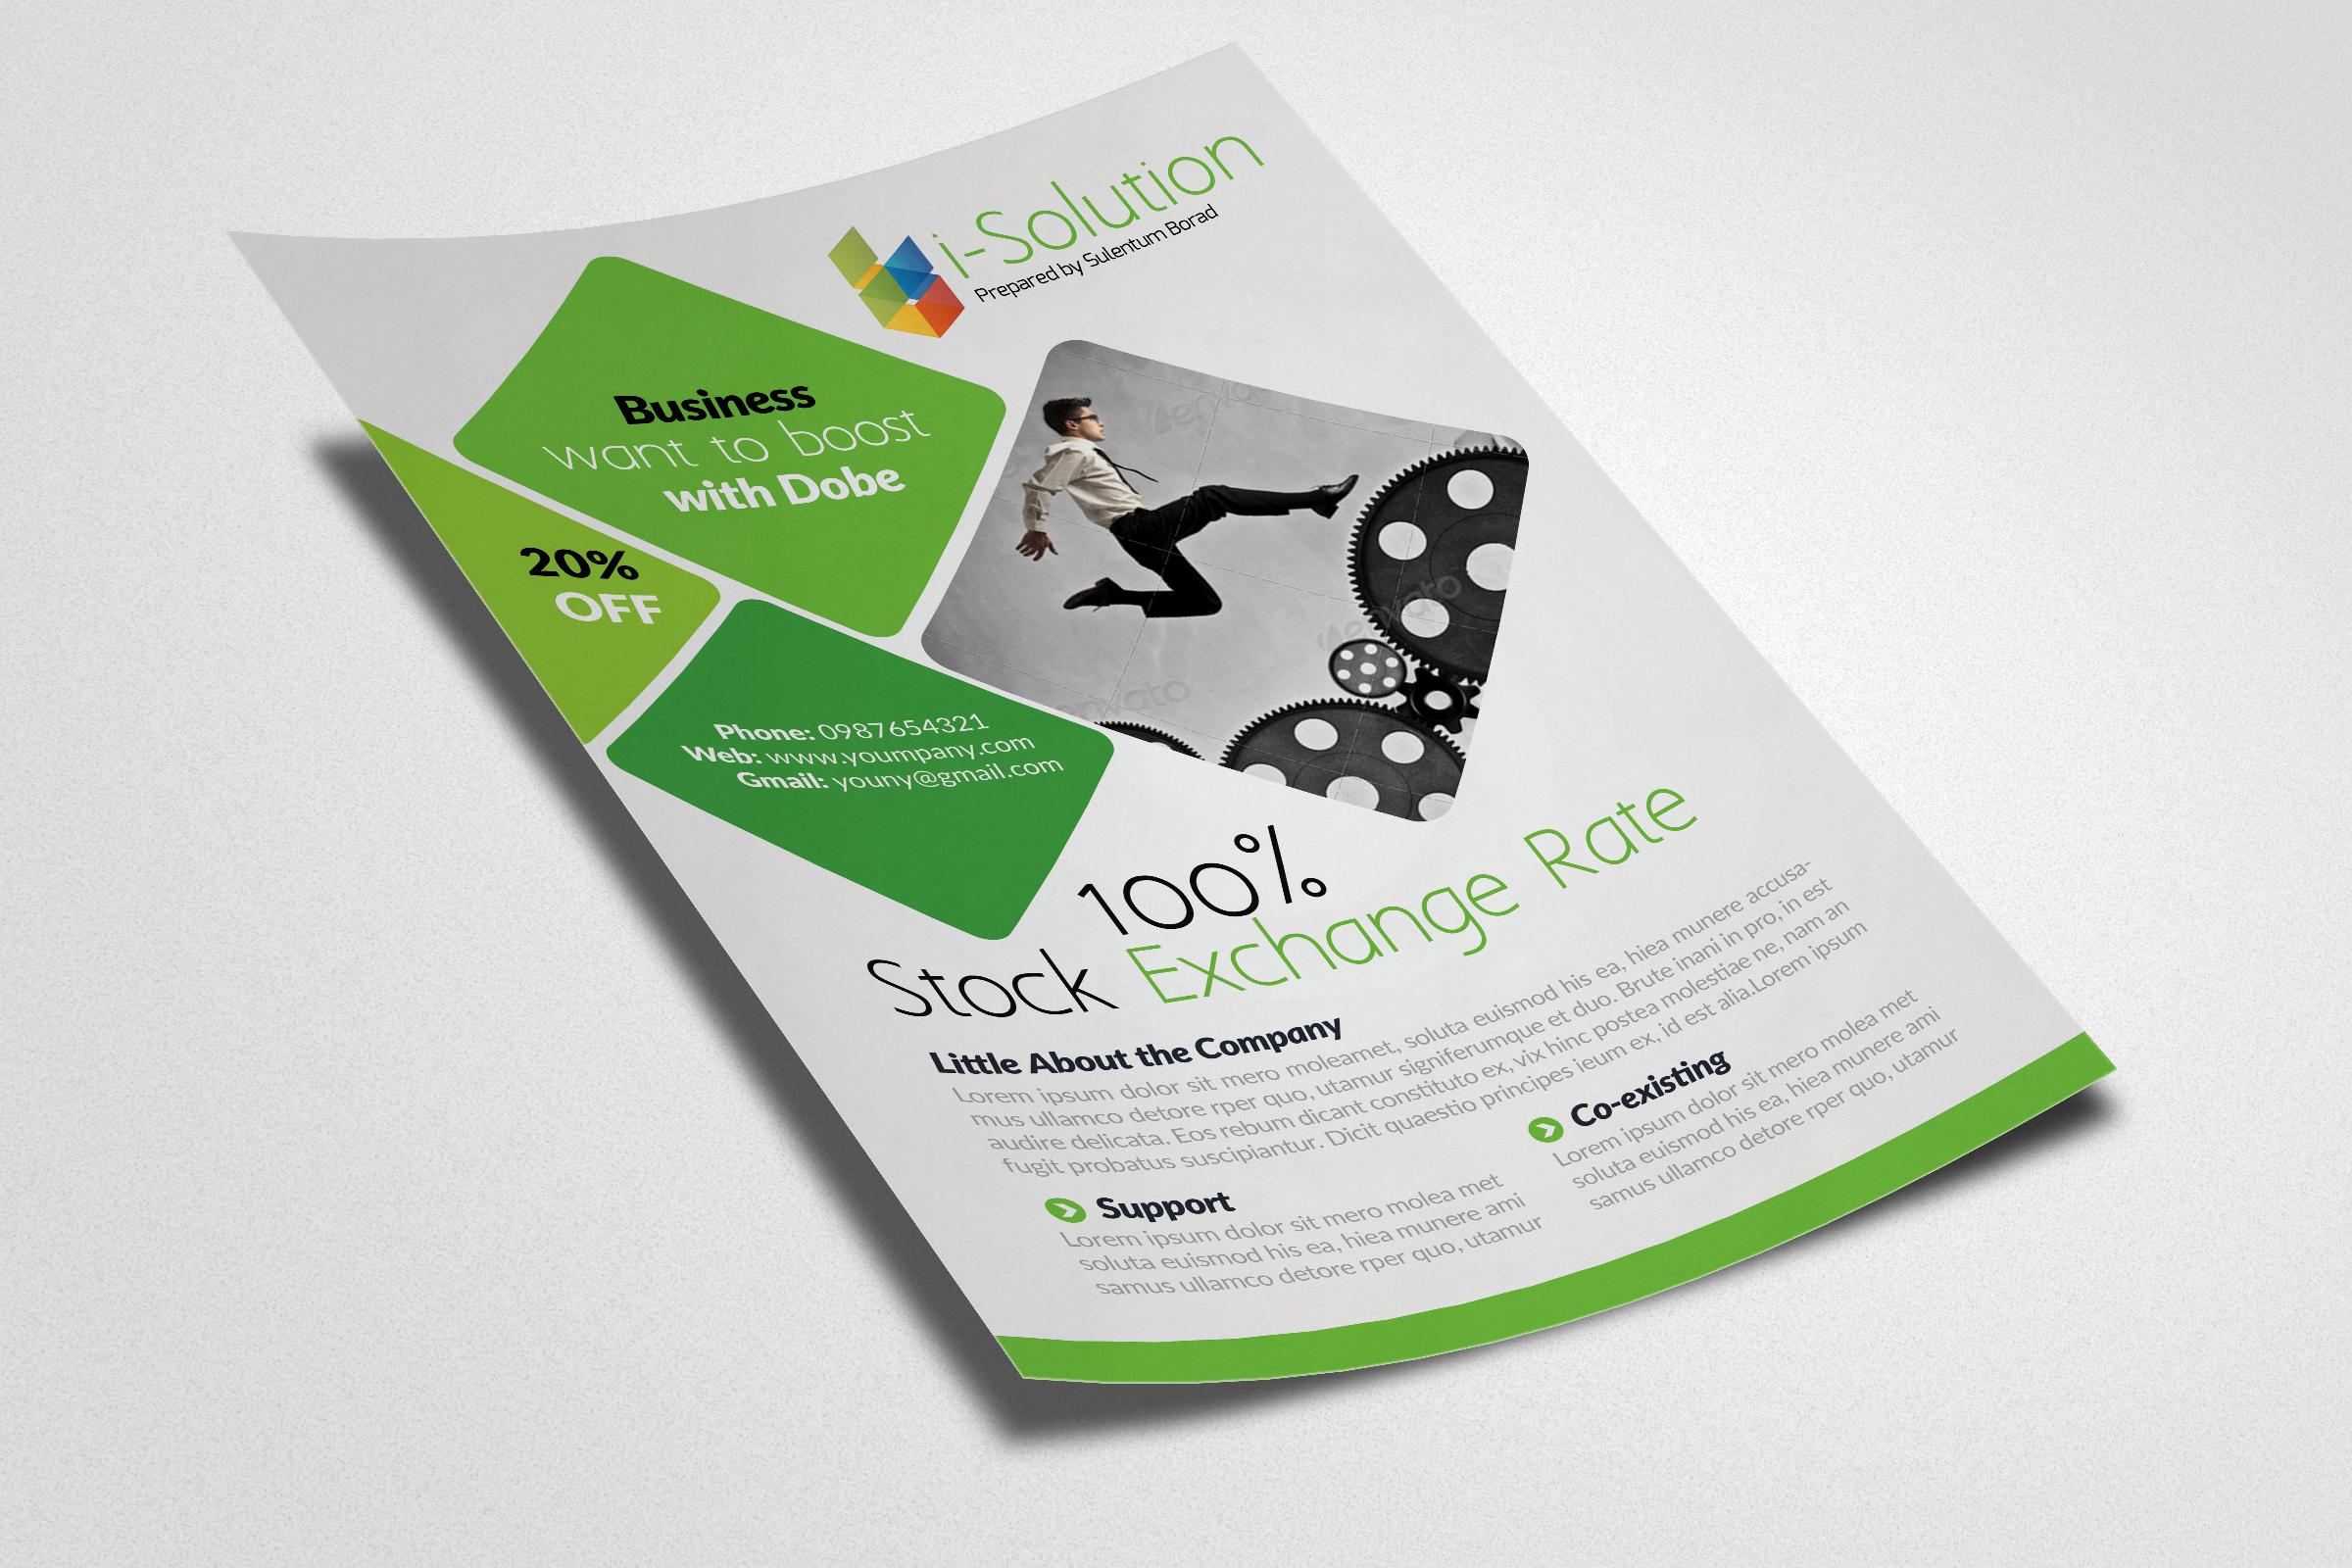 Business Strategic Management Flyer example image 2